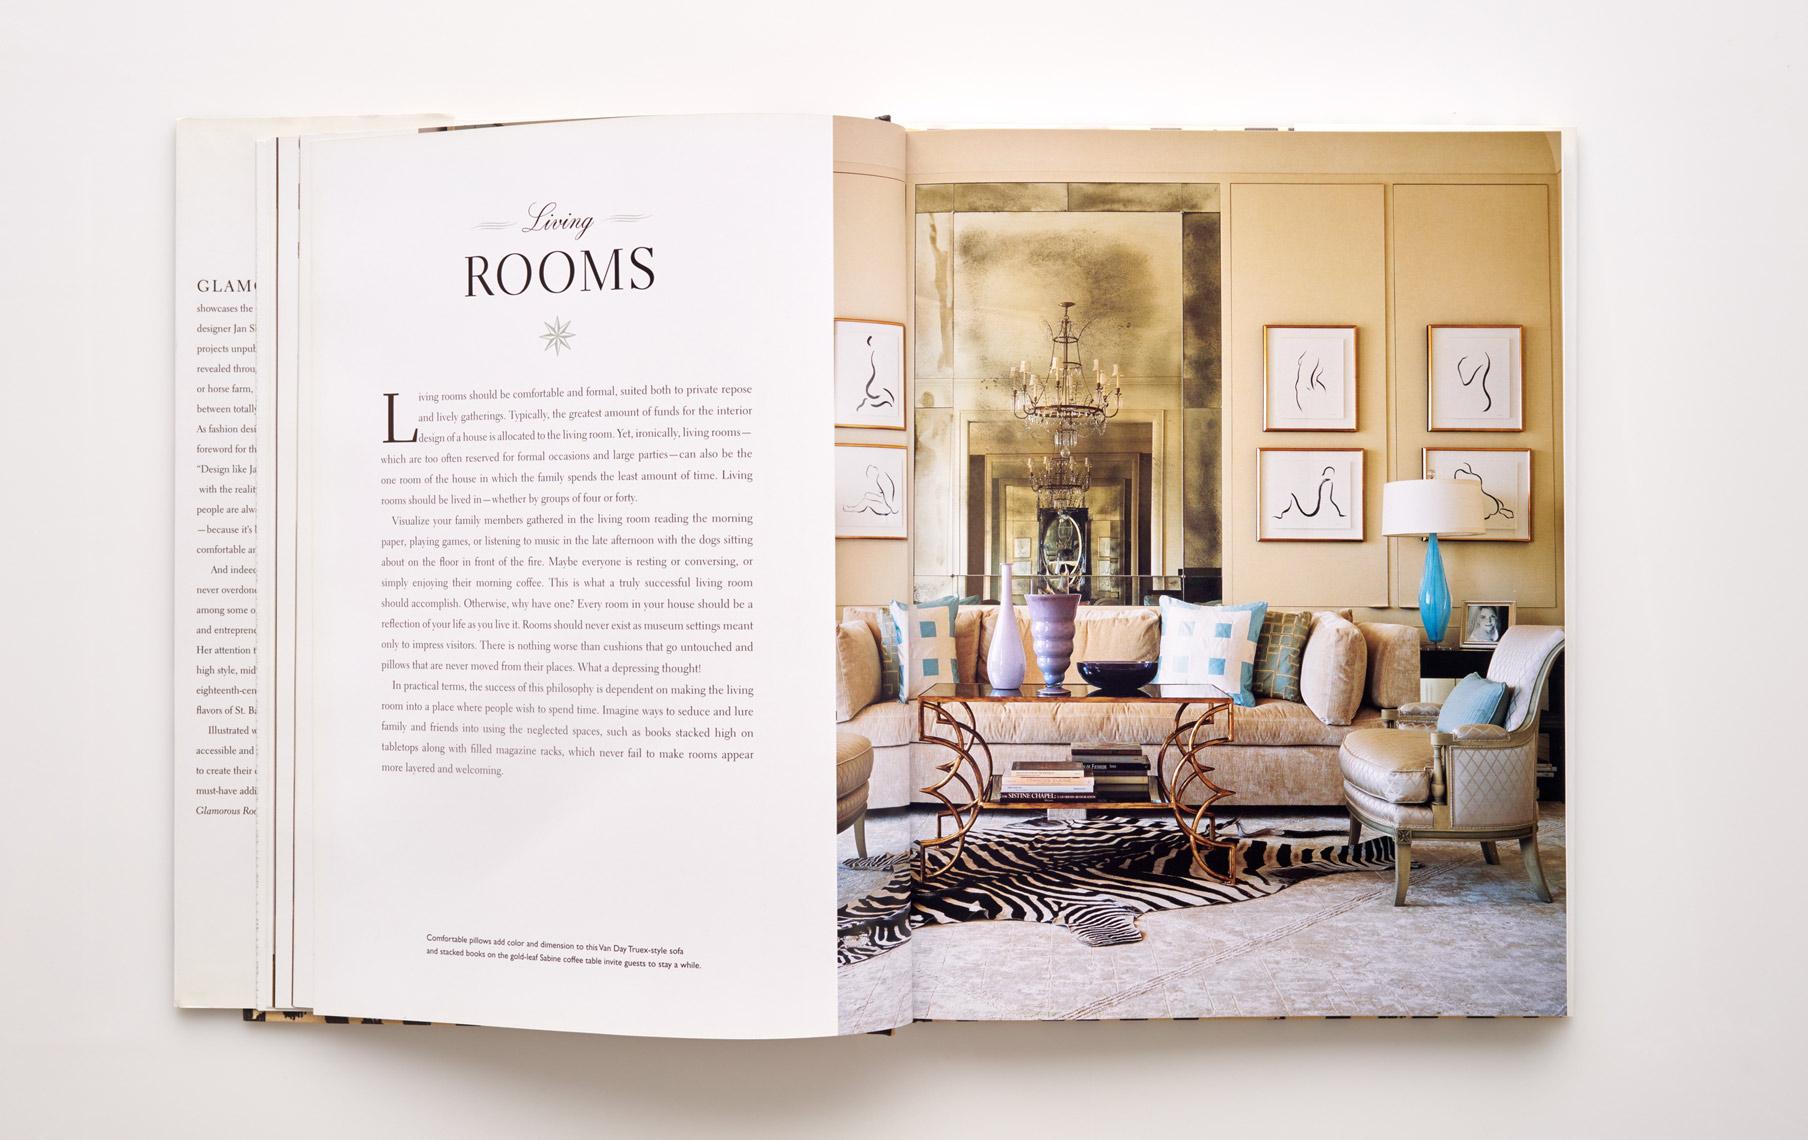 Stephen Karlisch Jan Showers Glamorous Rooms Living Room Title